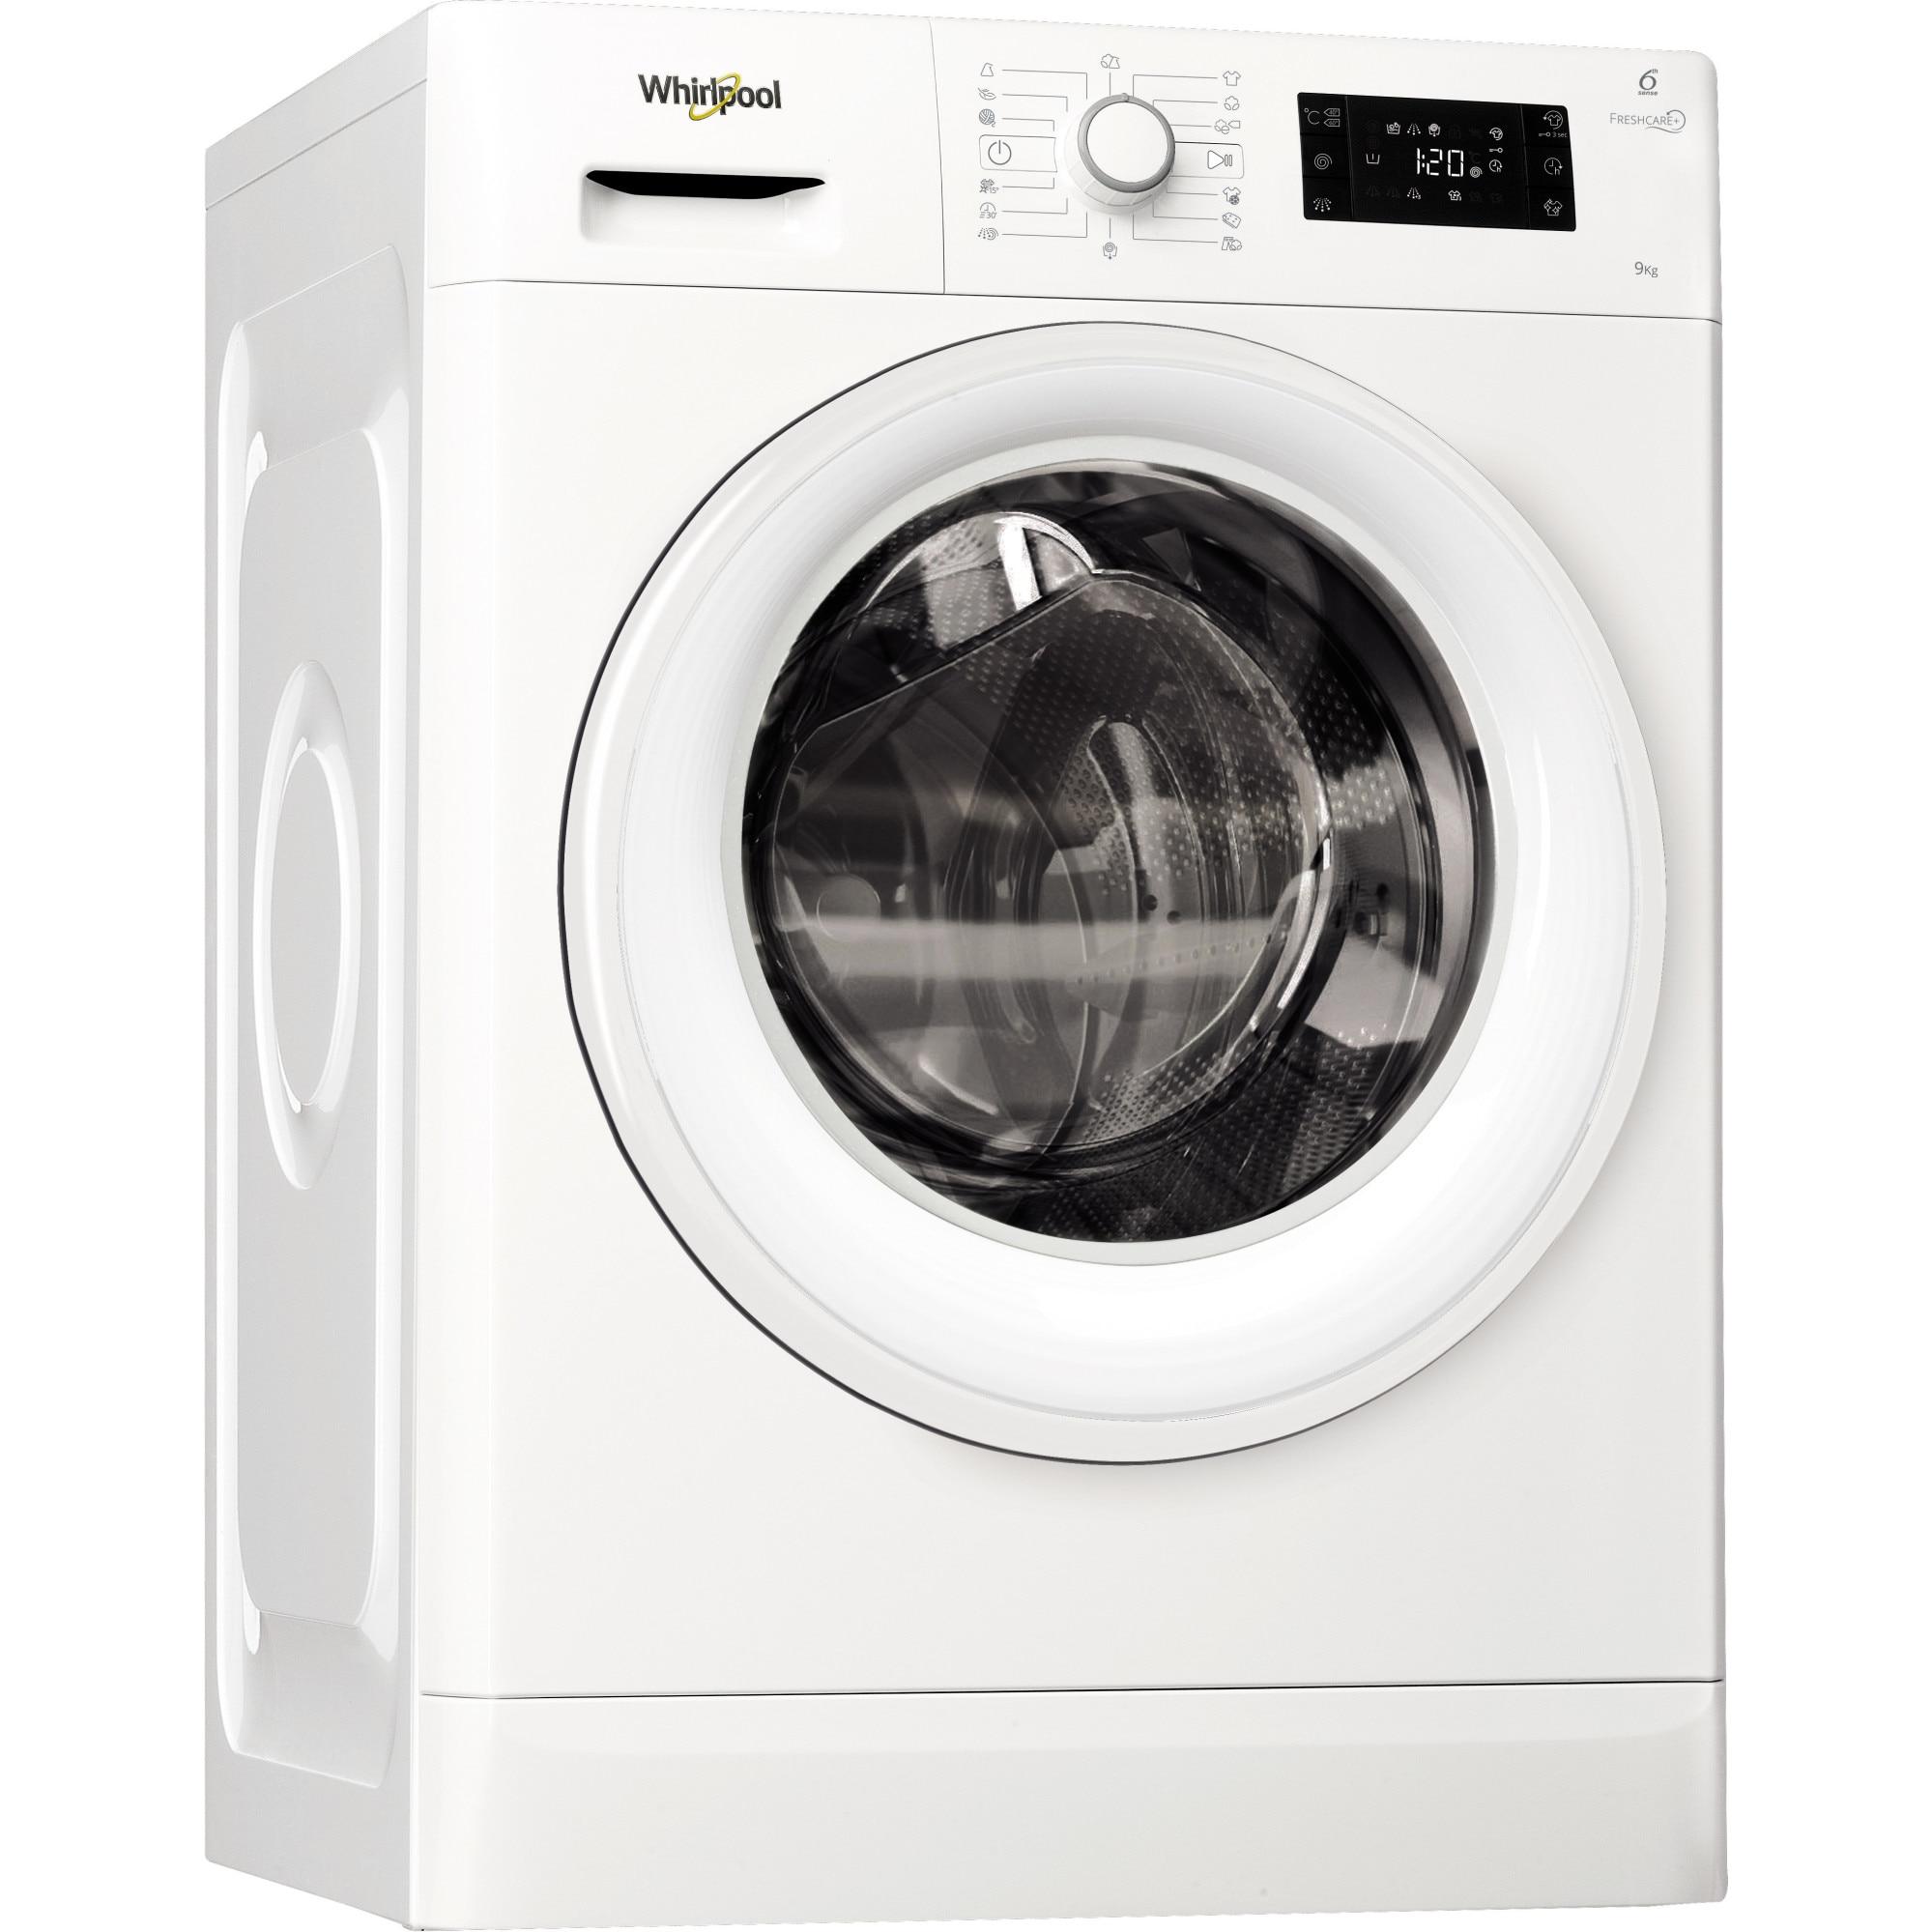 Fotografie Masina de spalat rufe Whirlpool FreshCare+ FWG91484W EU, 6th Sense Colours, 9 kg, 1400 RPM, Clasa A+++, Alb